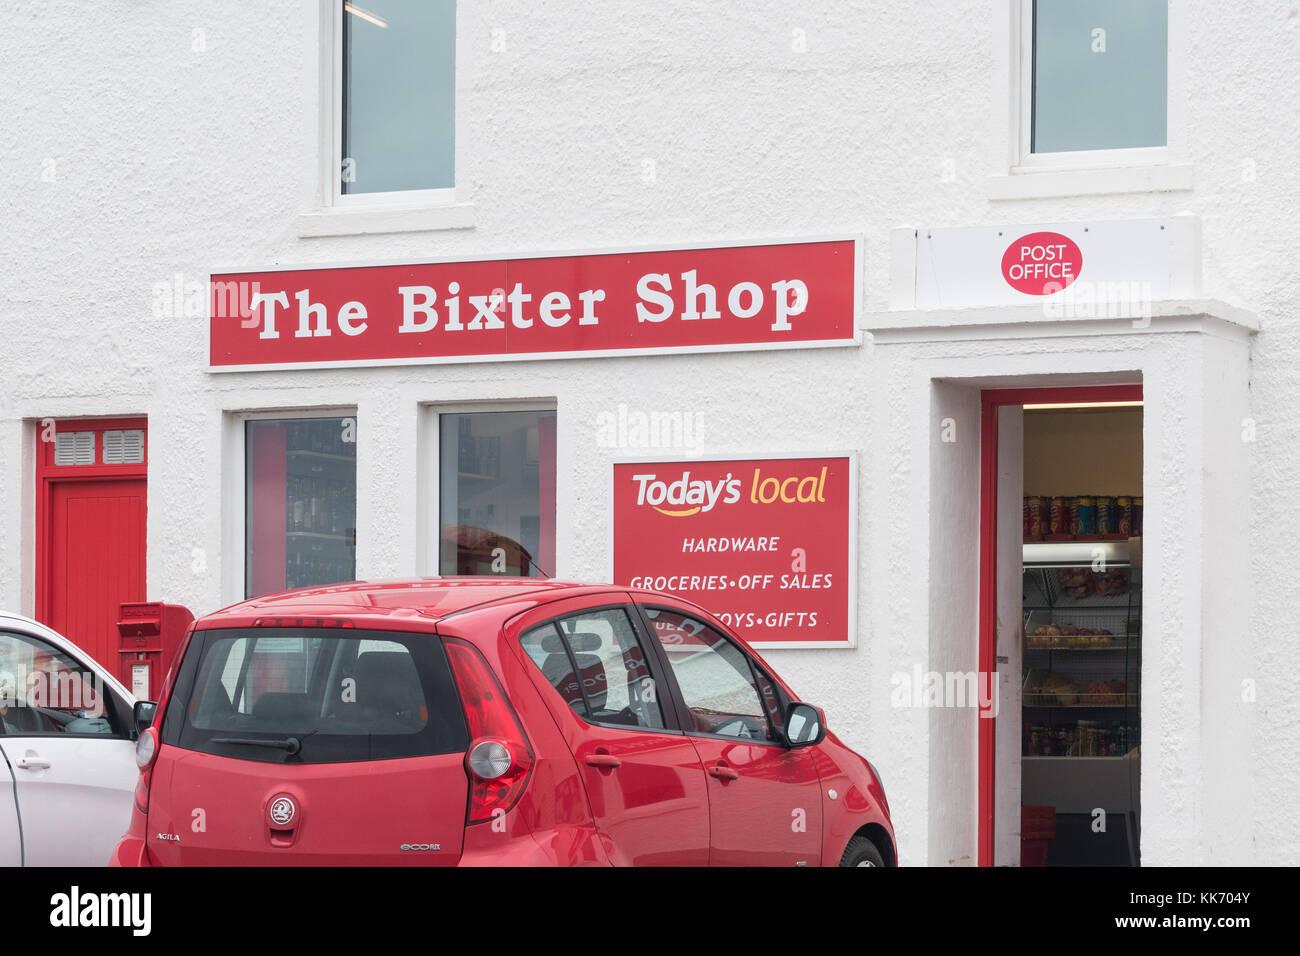 Shetland Islands shop and post office at Bixter, Shetland, Scotland, UK - Stock Image